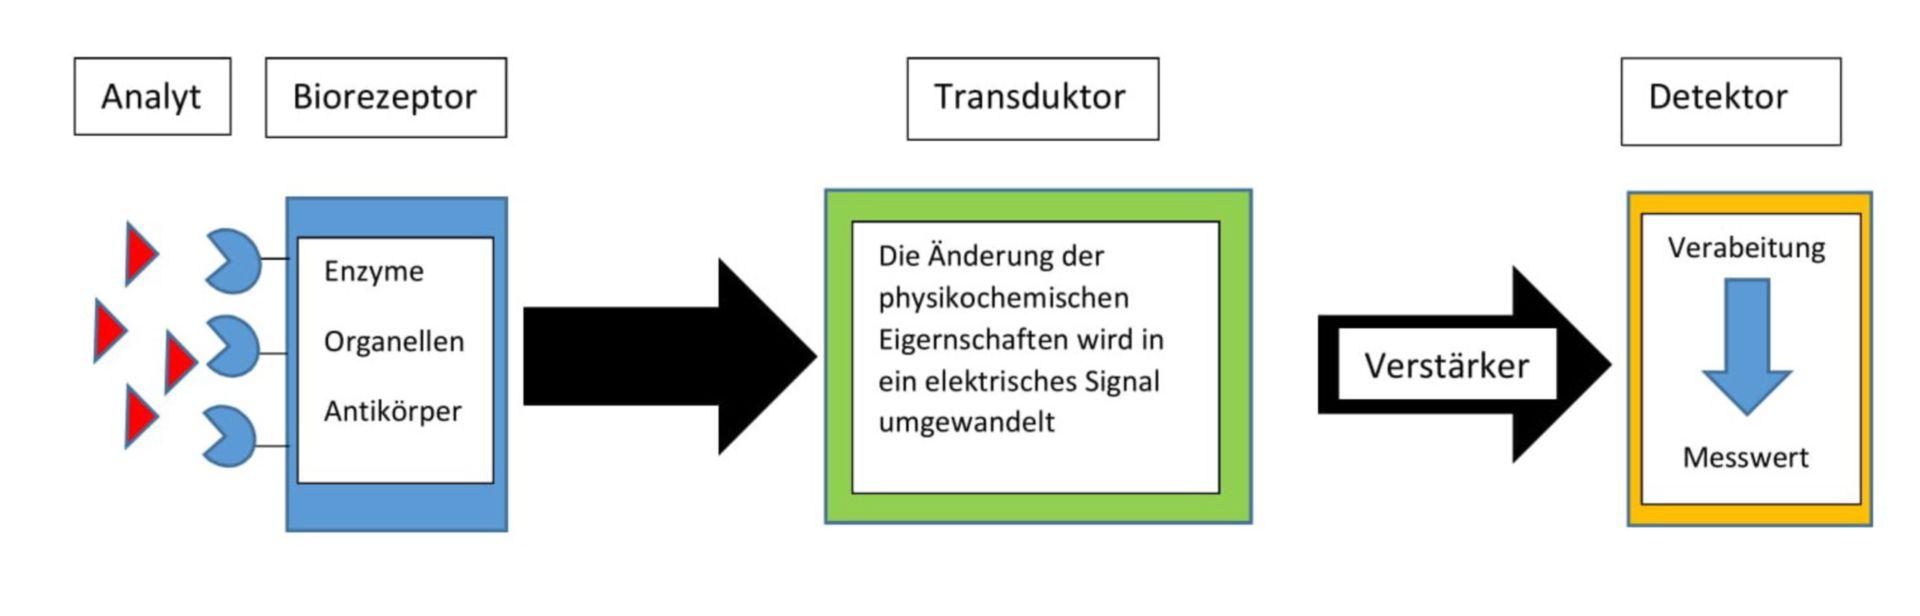 Aufbau eines Biosensors